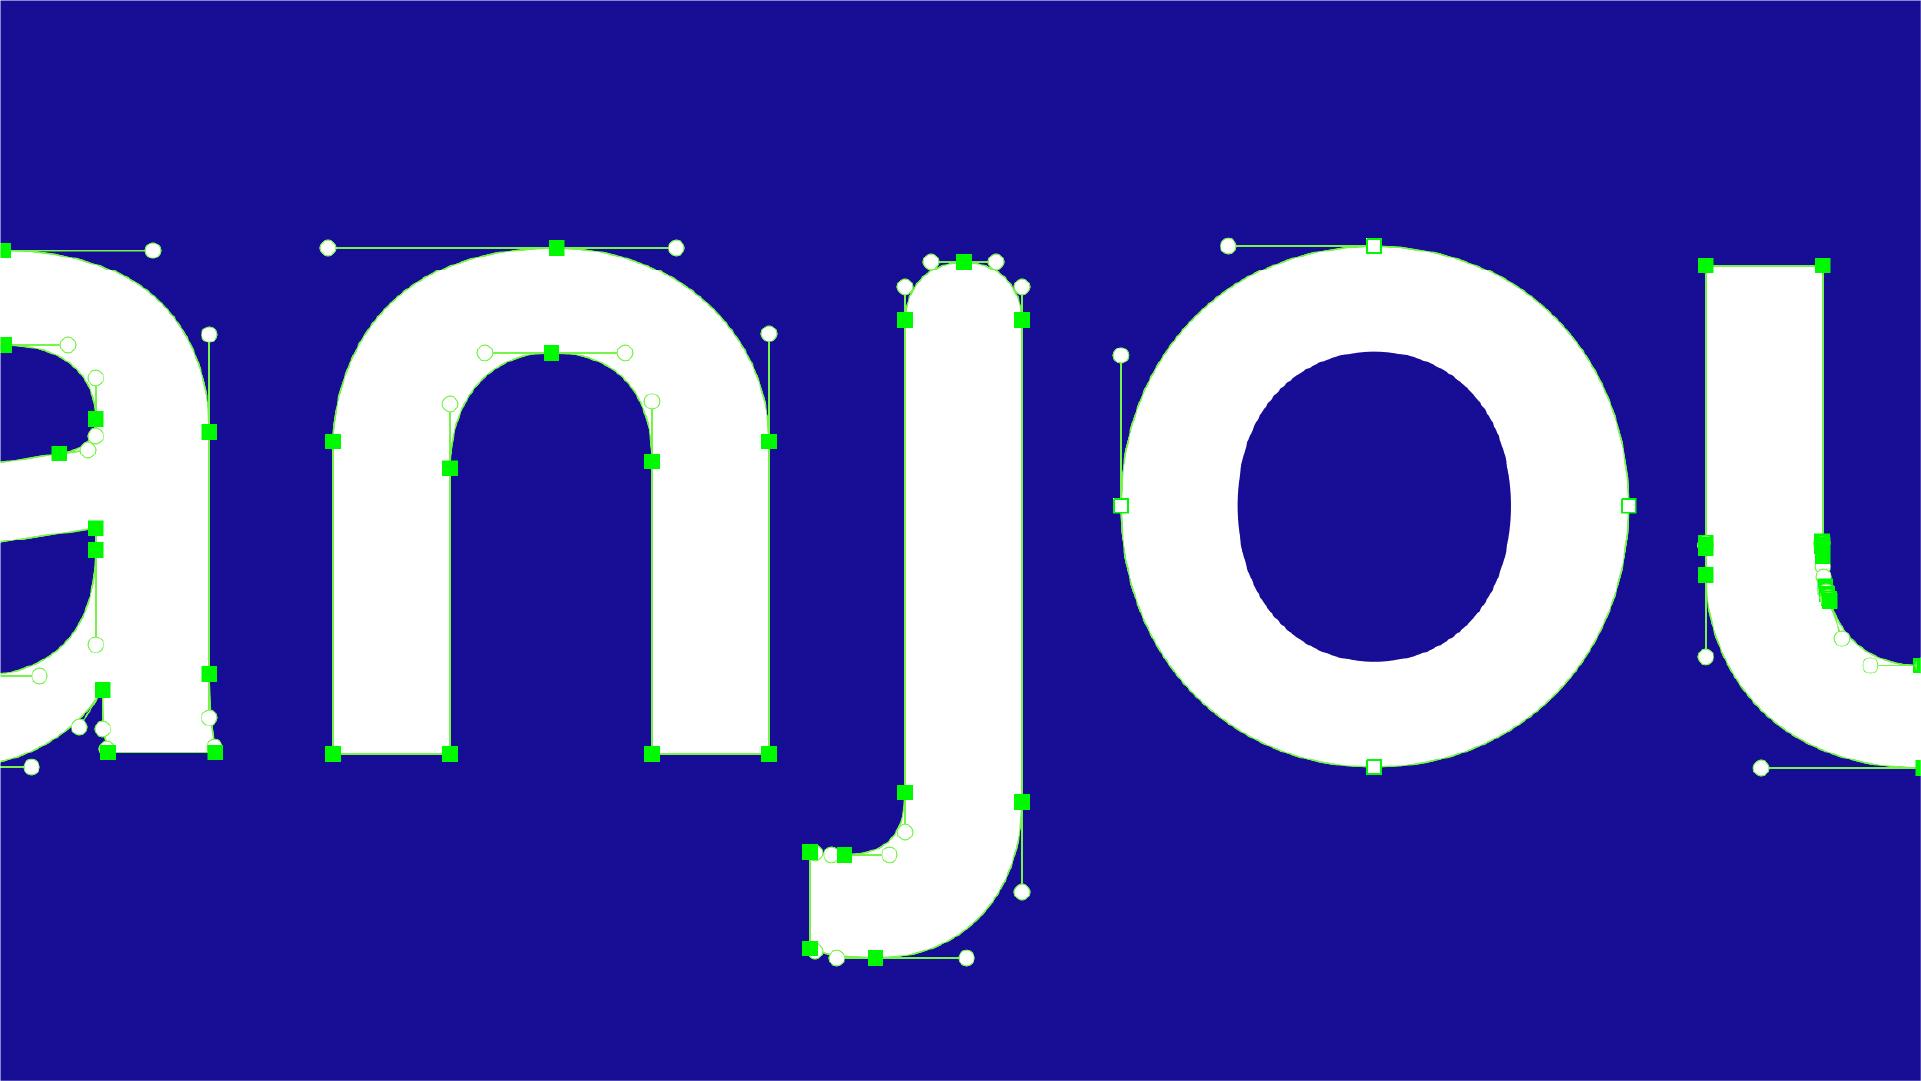 Anjou Accompagnement Association Identite Visuelle Typographie Circular Charte Graphique